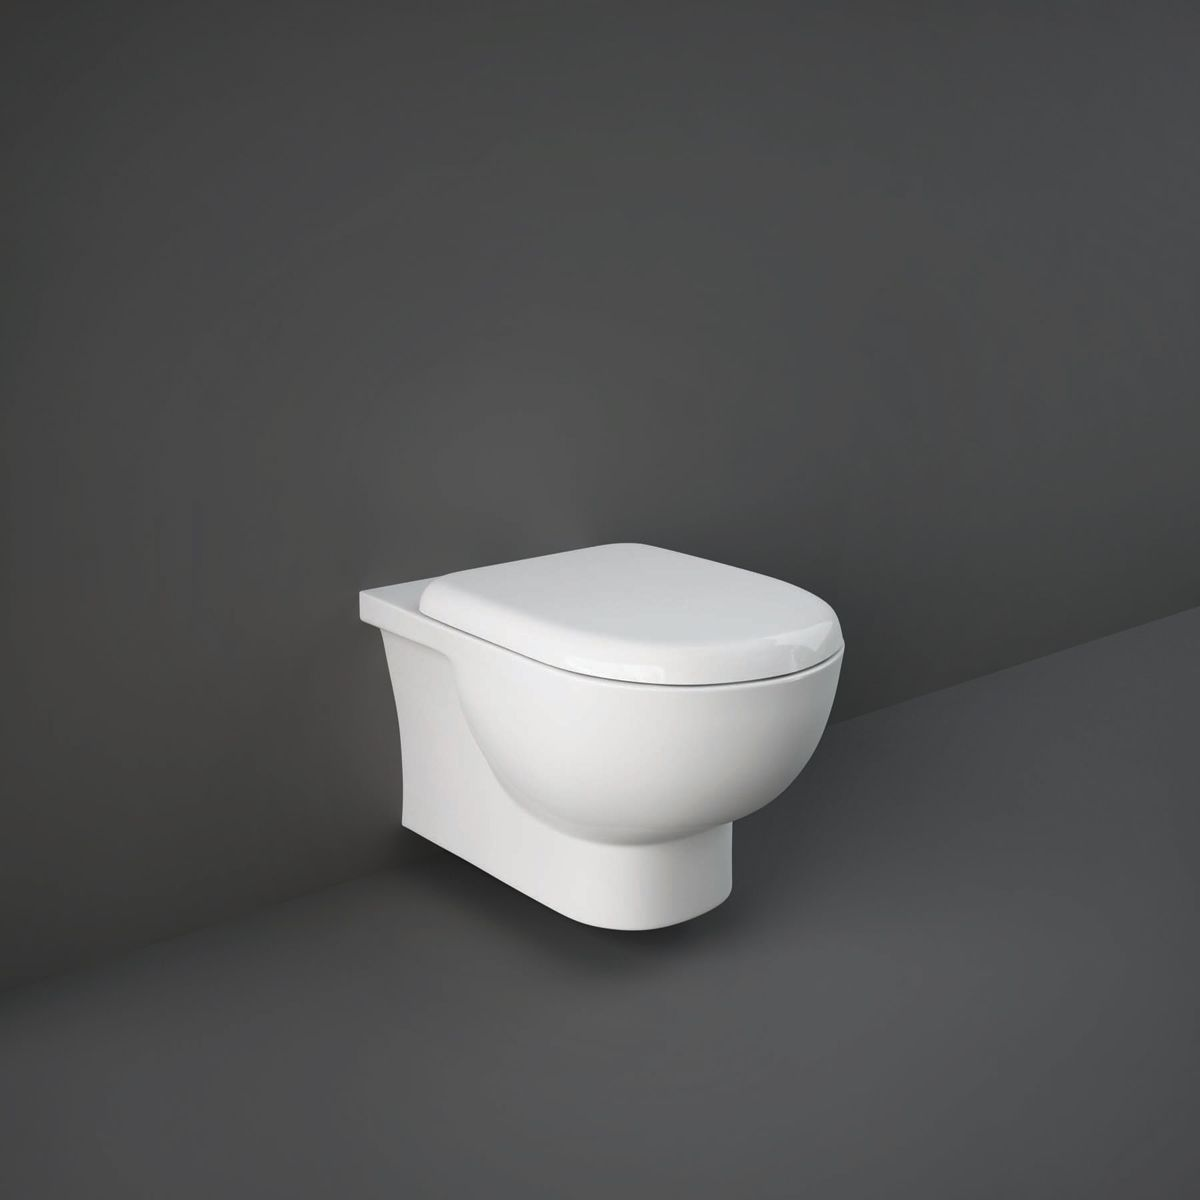 RAK Tonique Wall Hung Hidden Fixation Toilet with Soft Close Seat